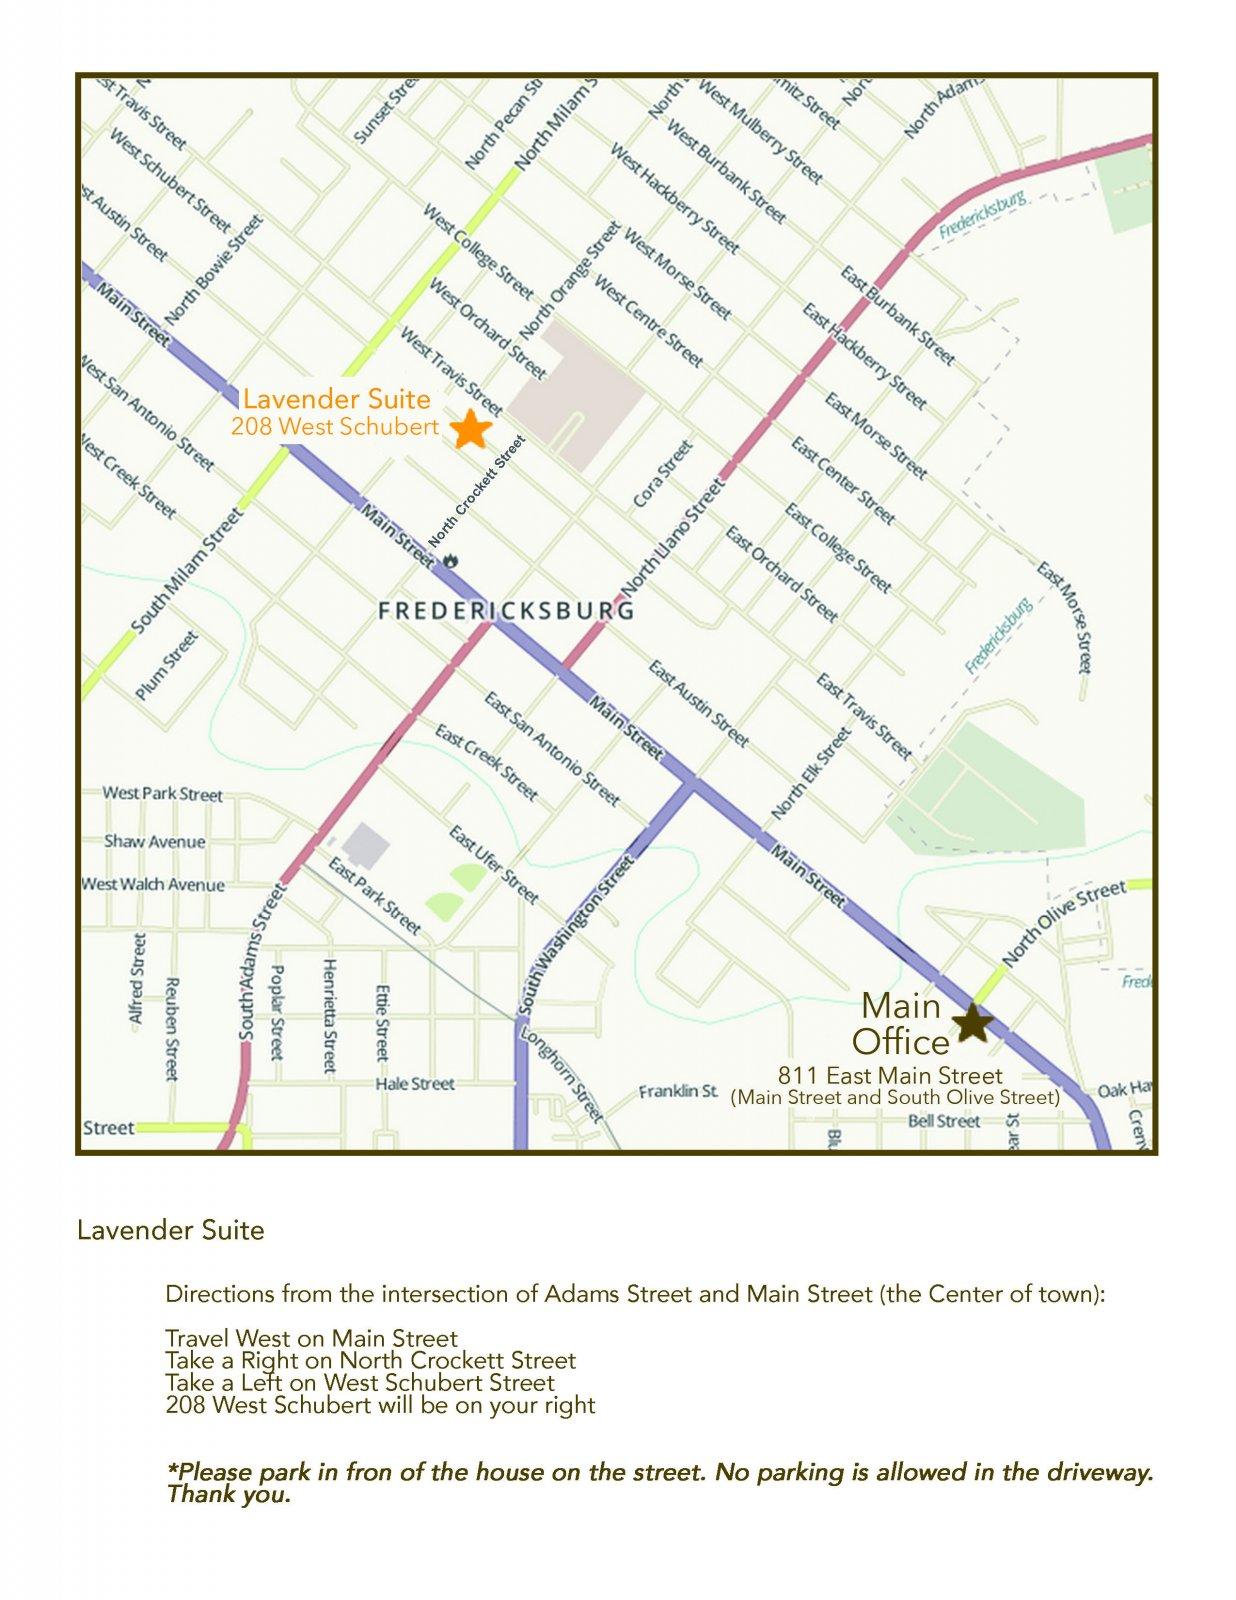 Lavender Suite Map | The Maplestone, Luxury Lodging of Fredericksburg, Texas